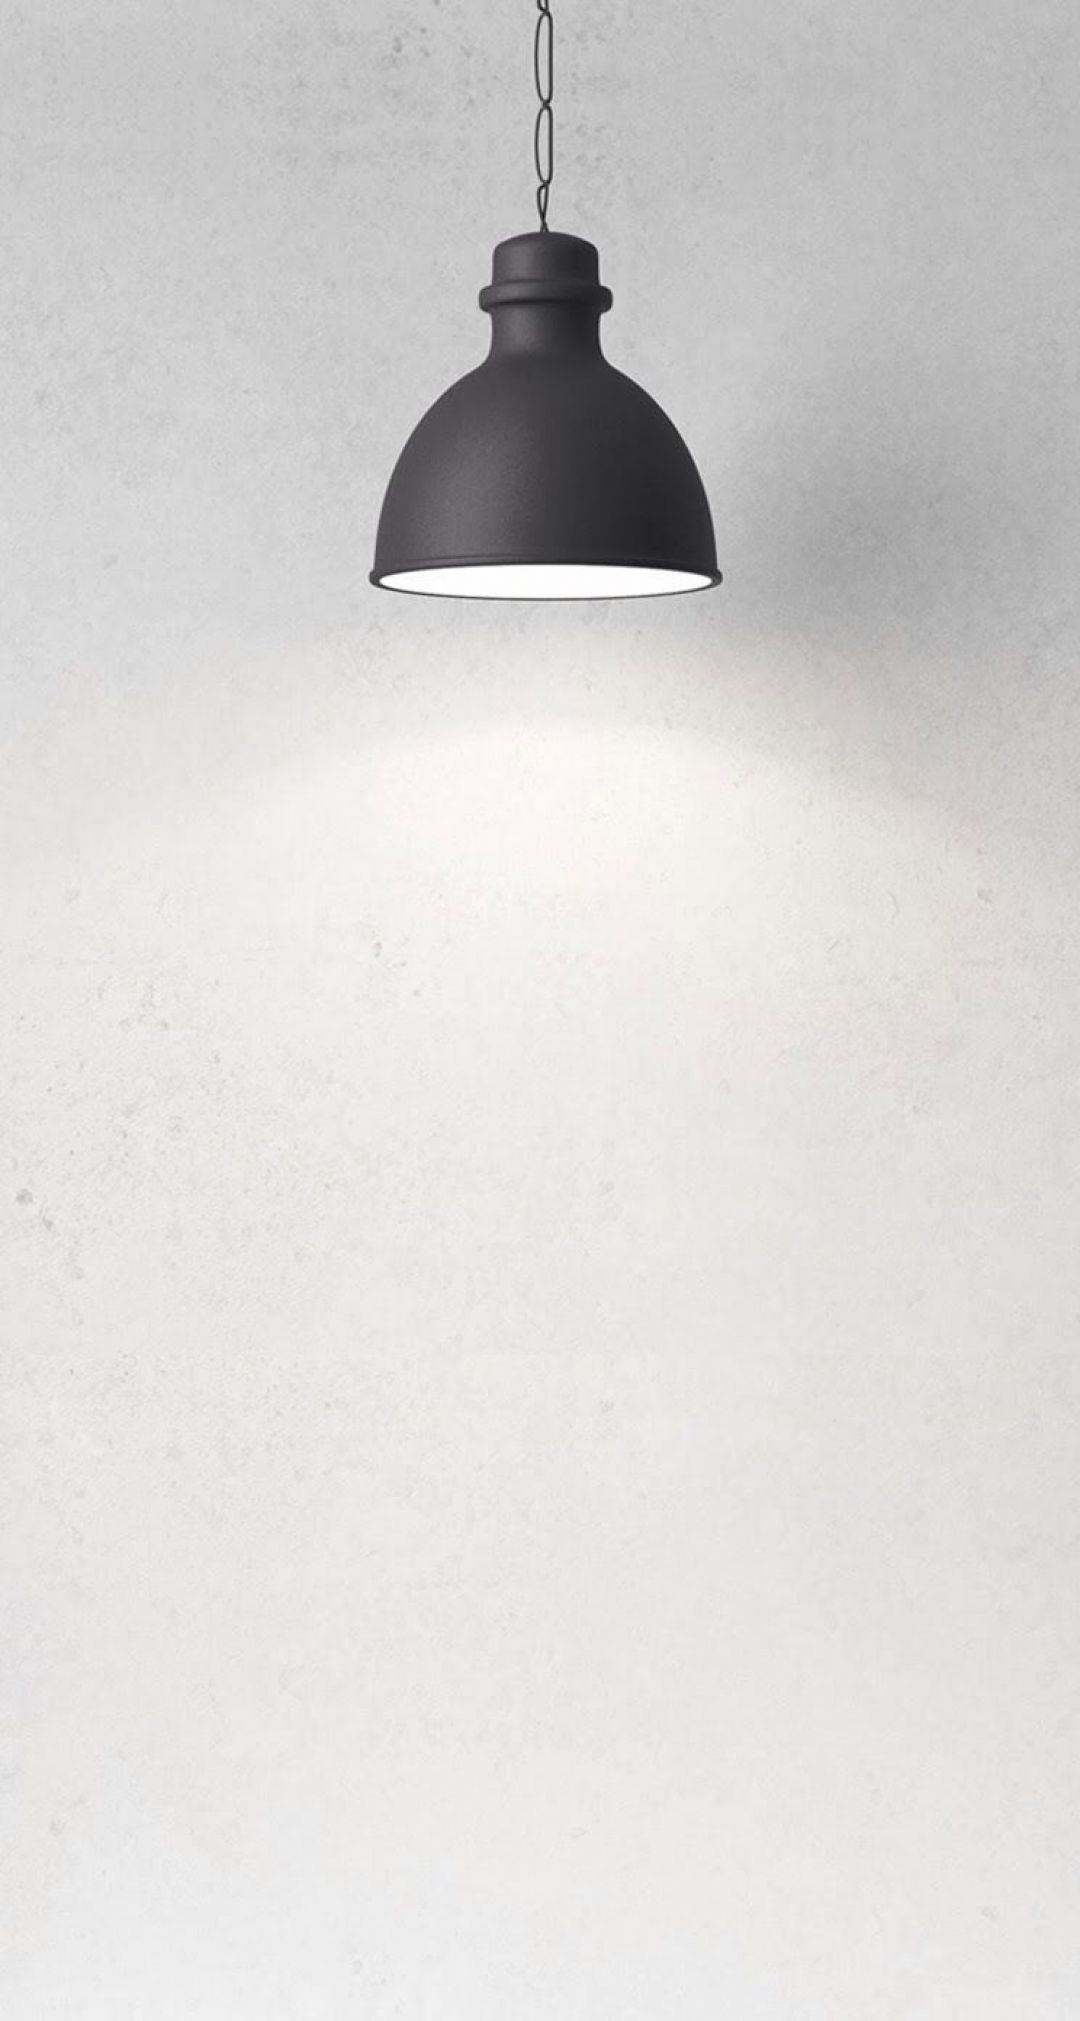 White Minimalist Iphone - Minimal Wallpaper Iphone 5 , HD Wallpaper & Backgrounds